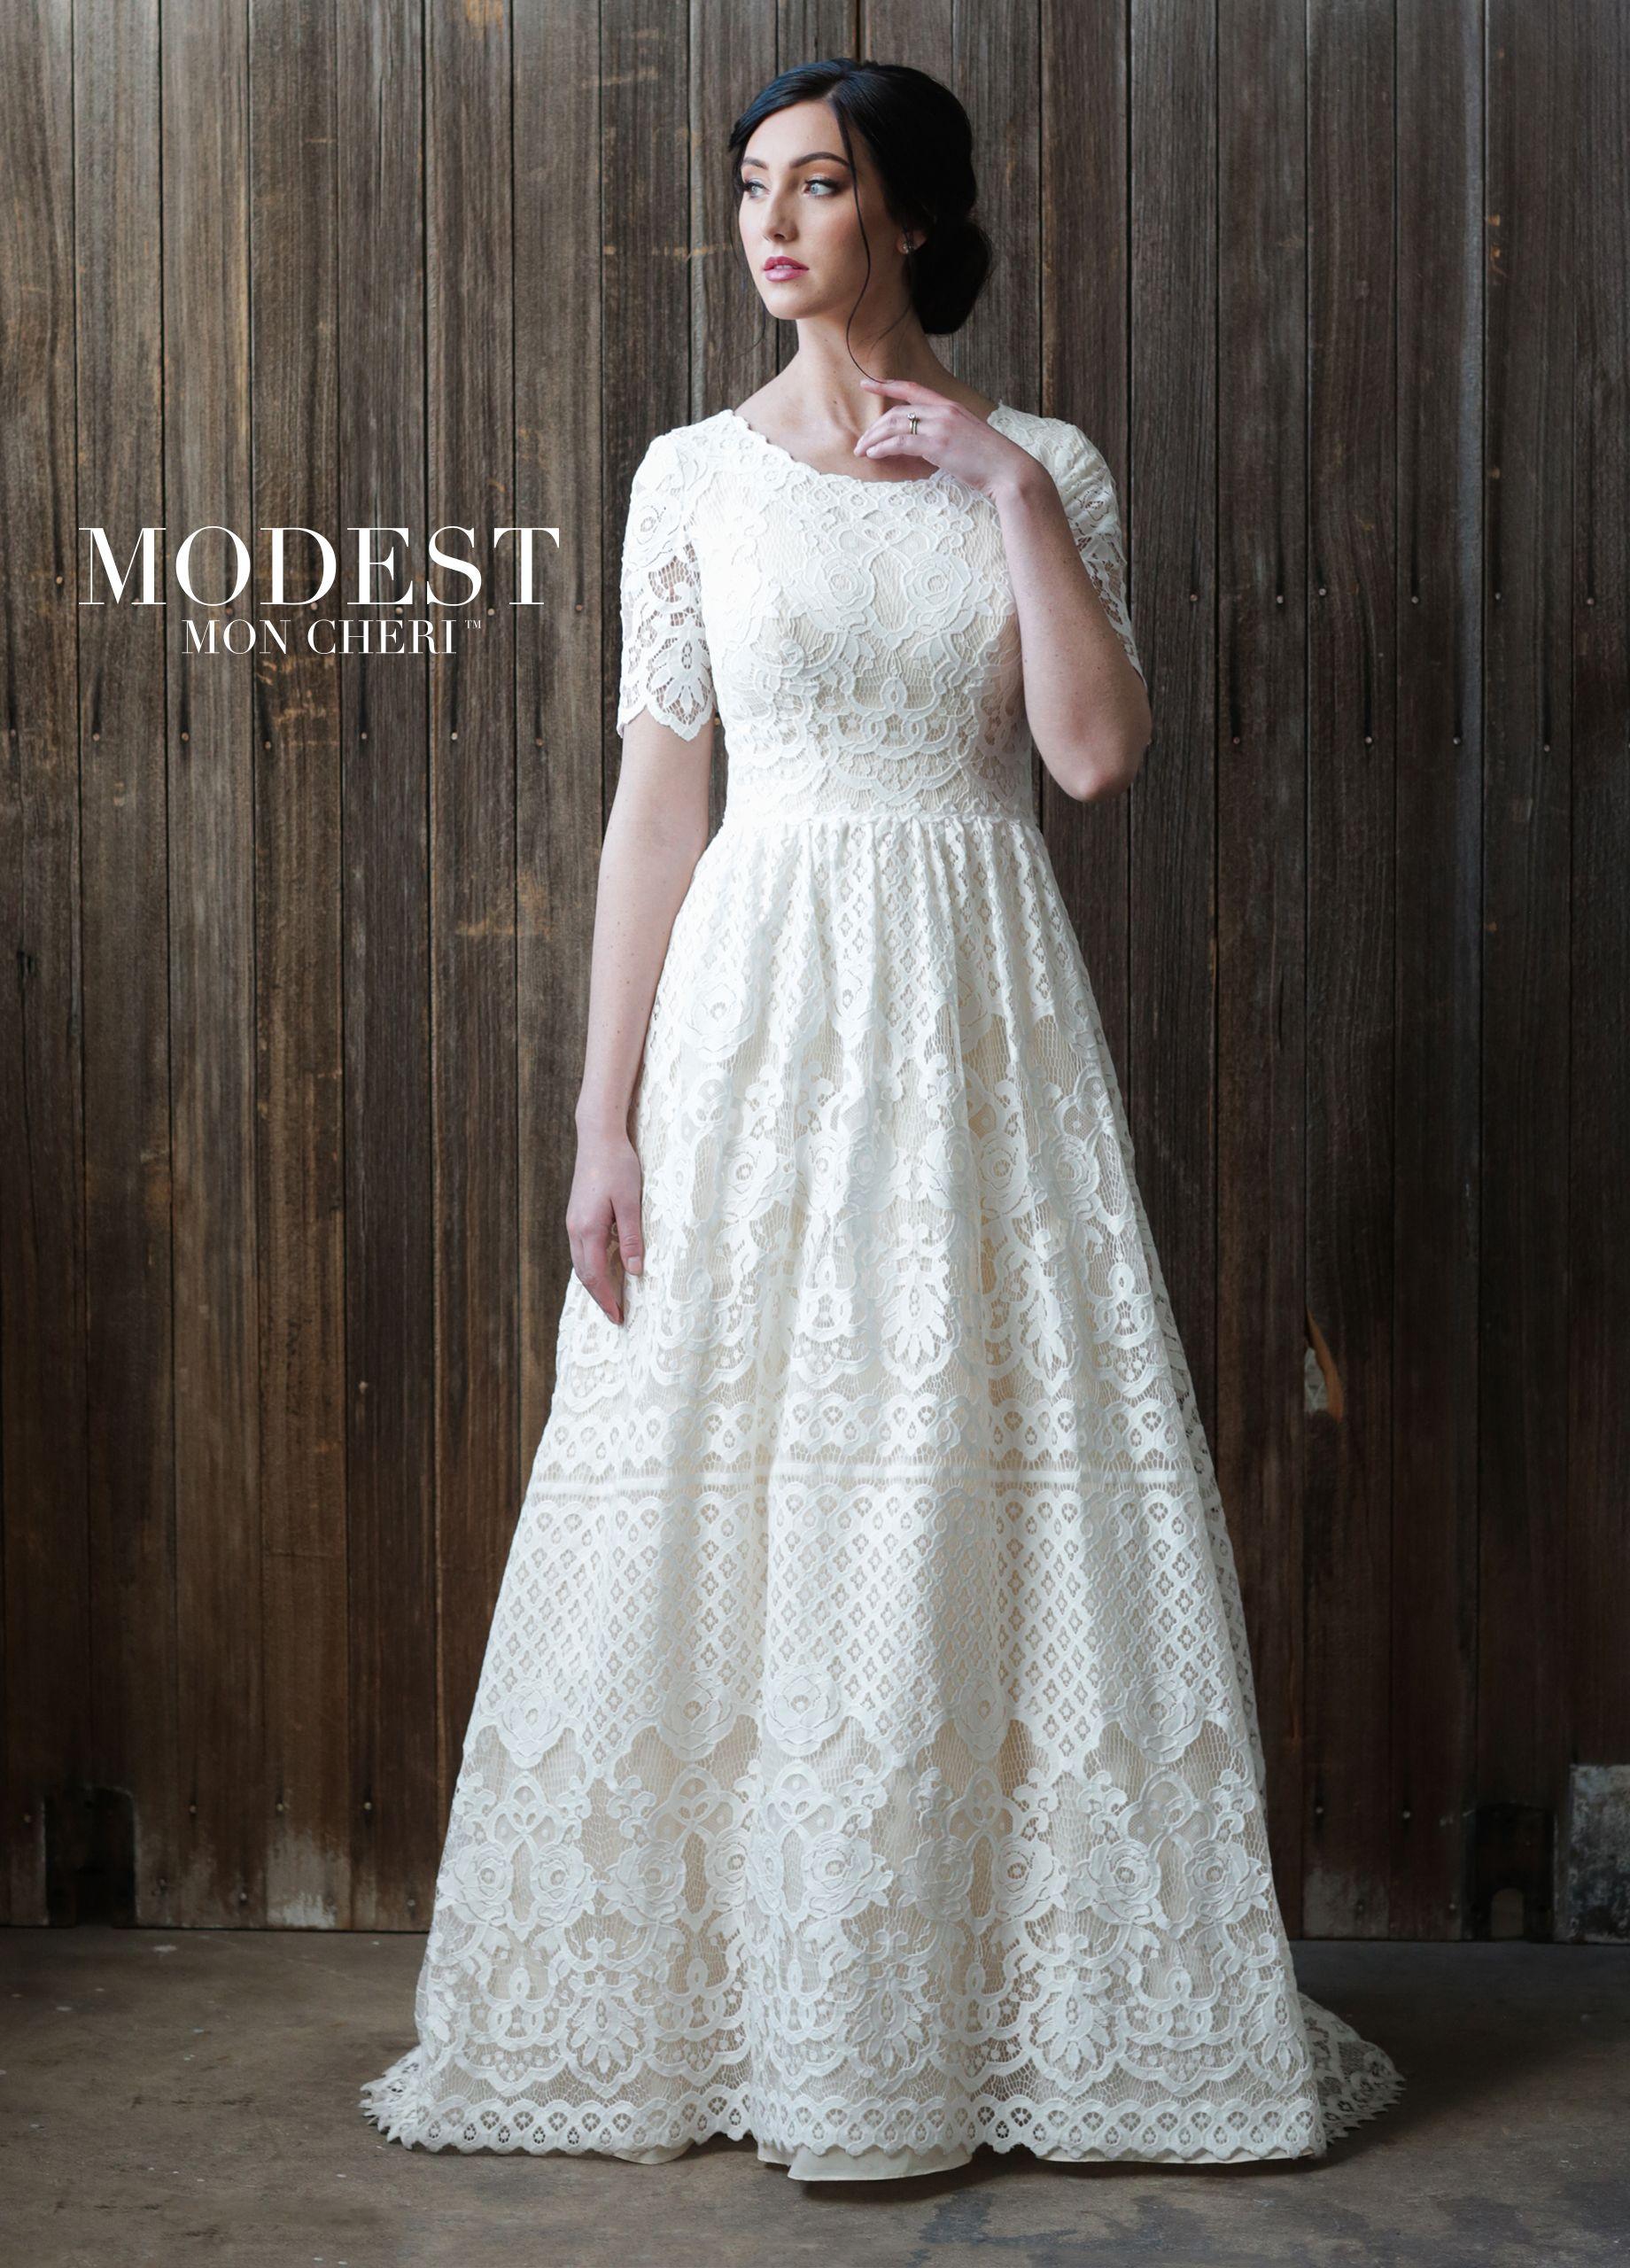 Lace Aline Conservative Wedding Dress TR21864 Modest